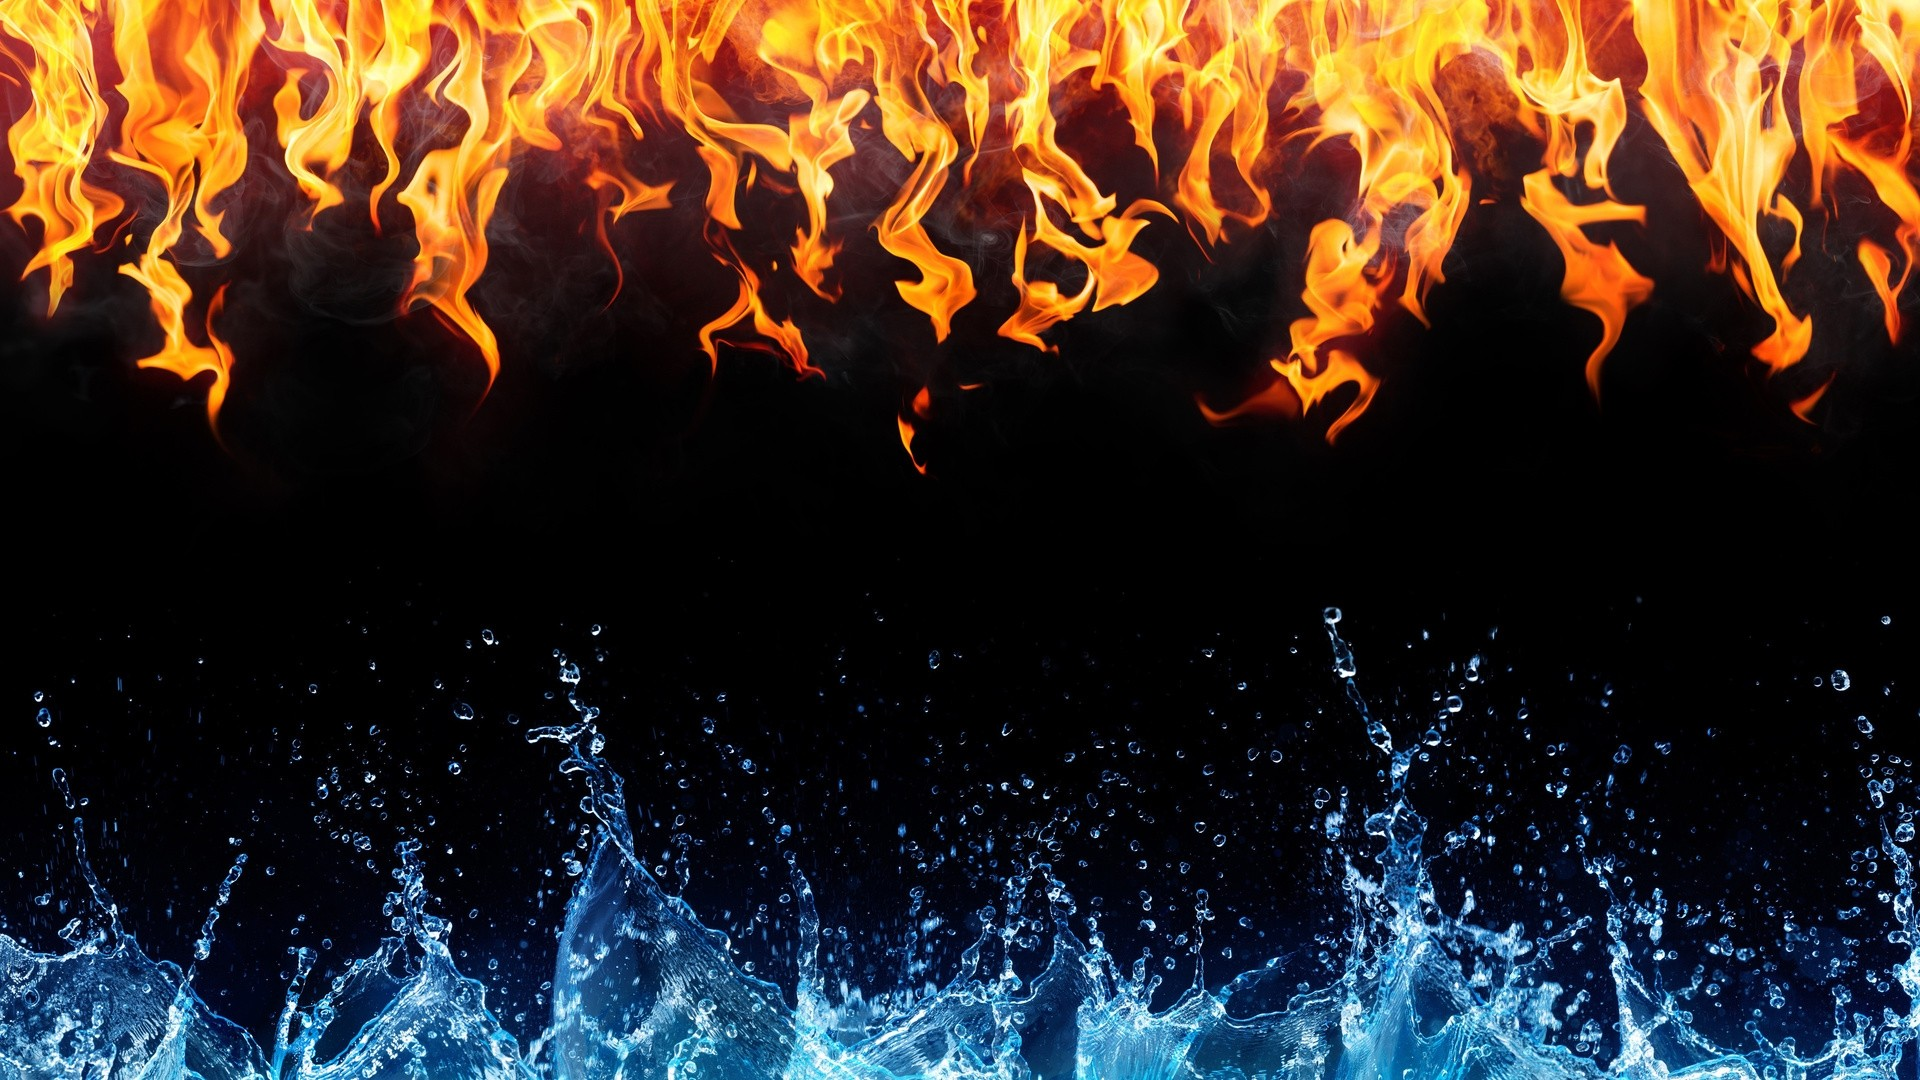 Flame HD Wallpaper